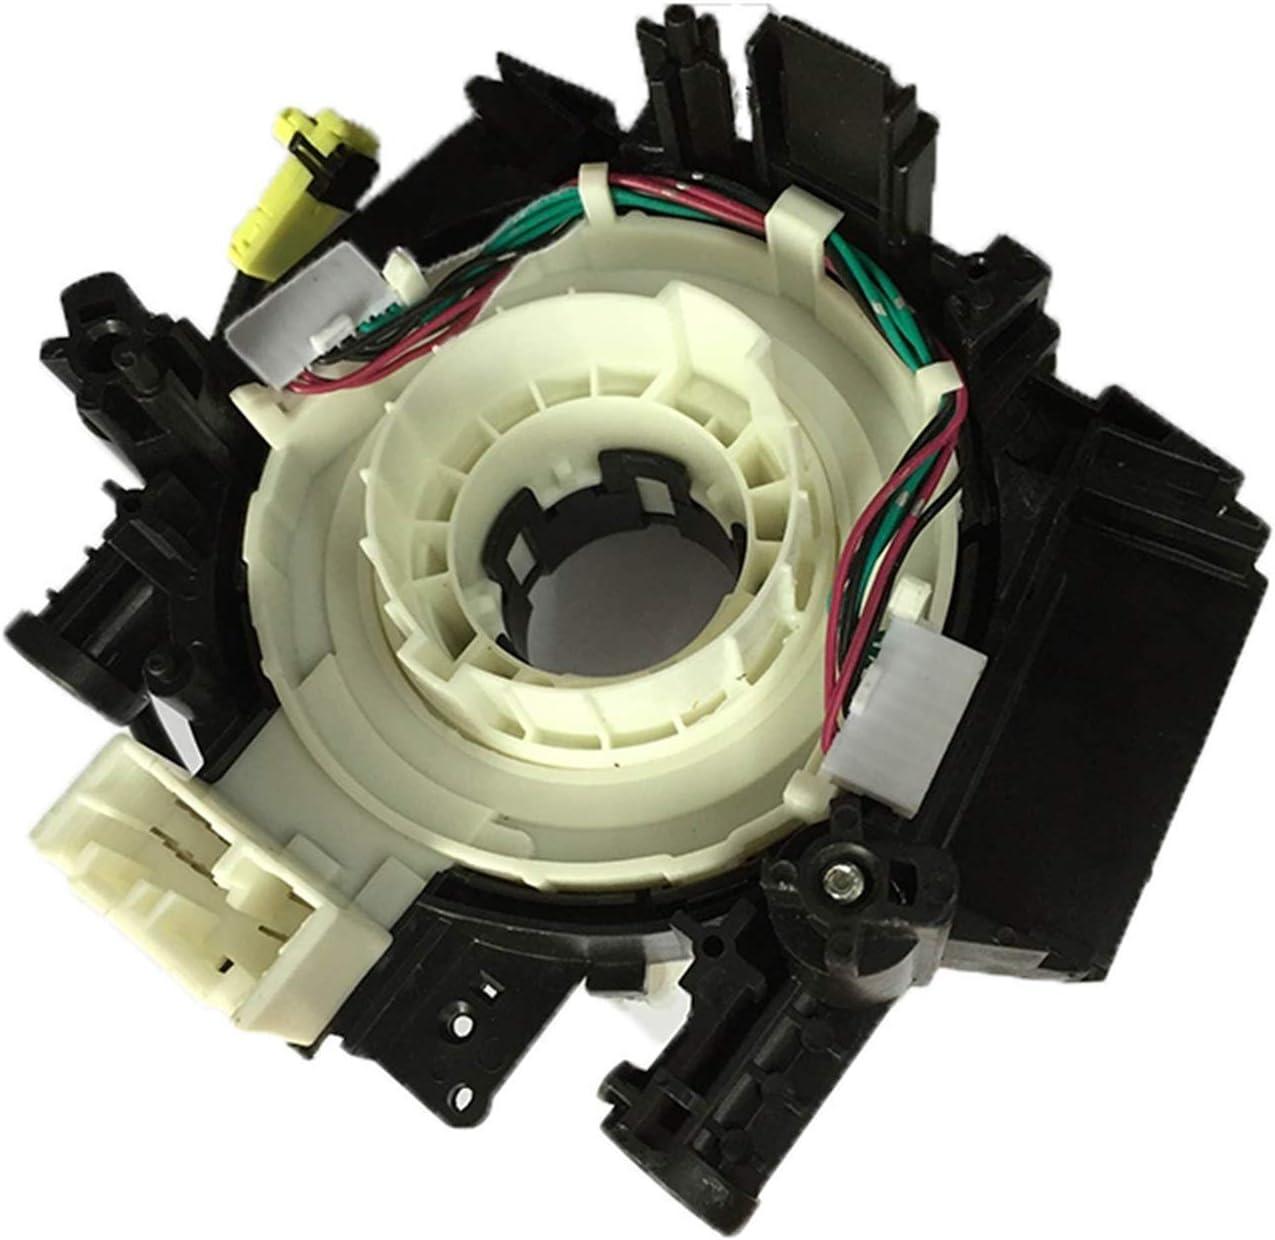 ZTY Zytang/® 25567-ET025 25567-JD003 25560-JD003 25560JD003 Cable Assy Fit para Nissan Navara Tiida Pathfinder R51M B5567-JD00A 25567ET025 25567